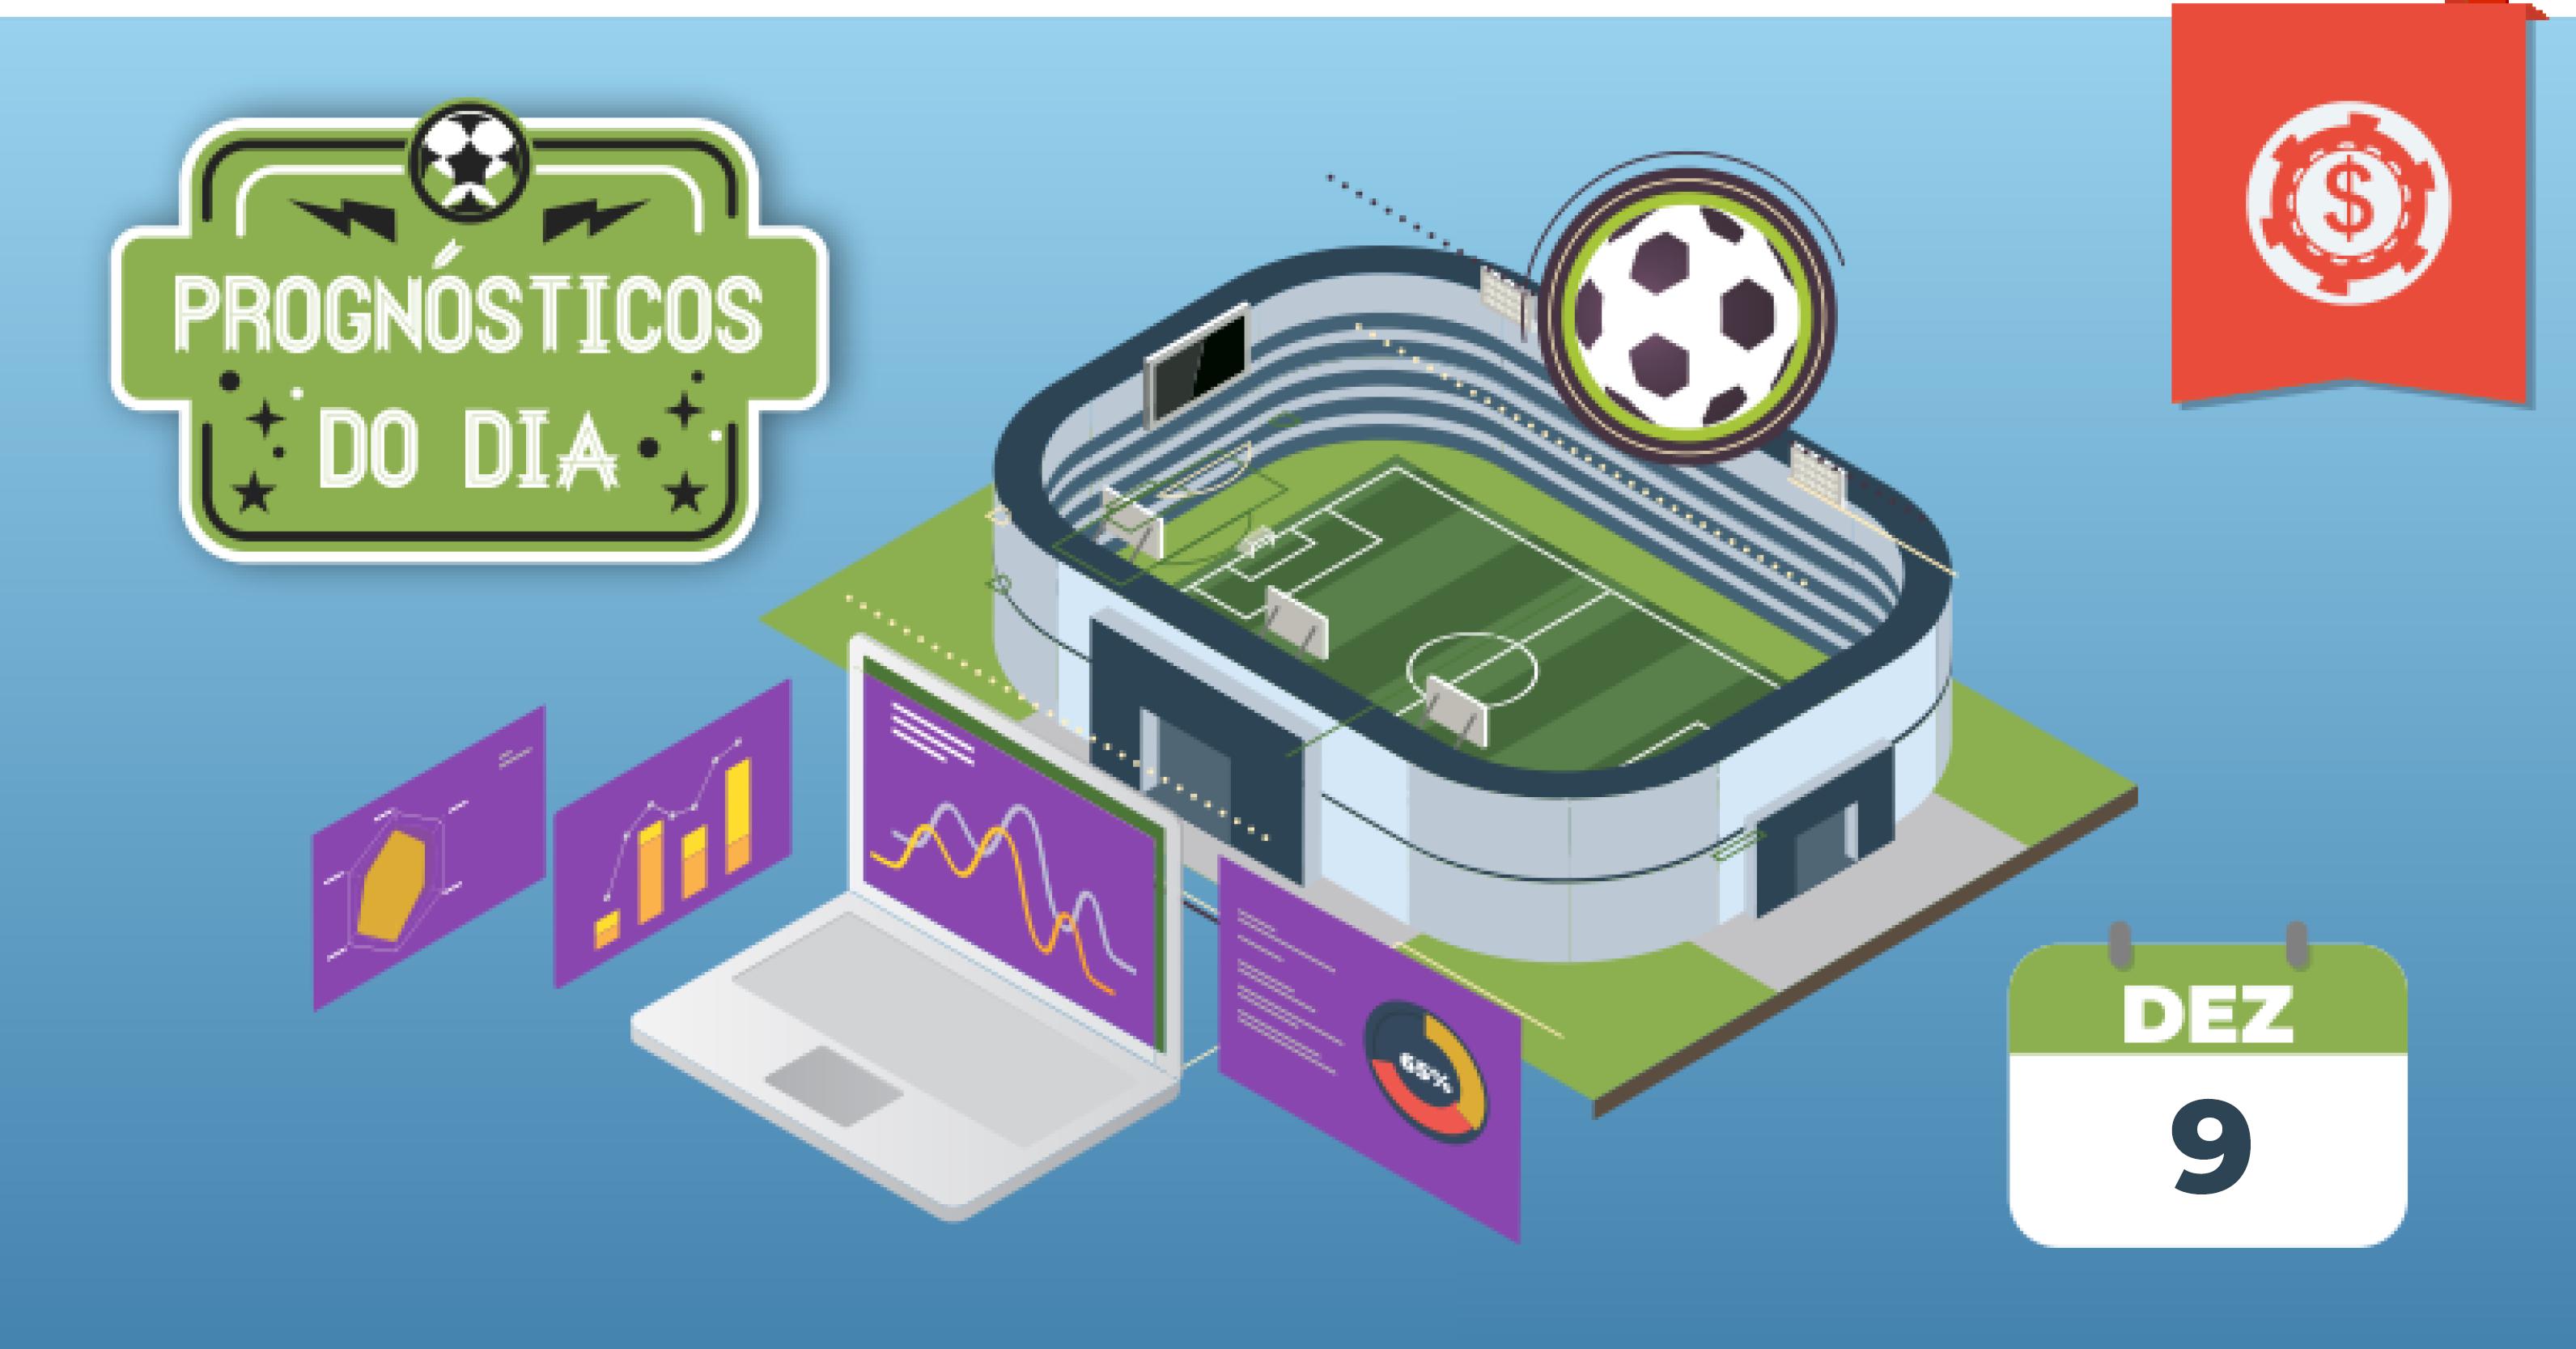 palpites-futebol-hoje-prognosticos-9-dezembro-2019